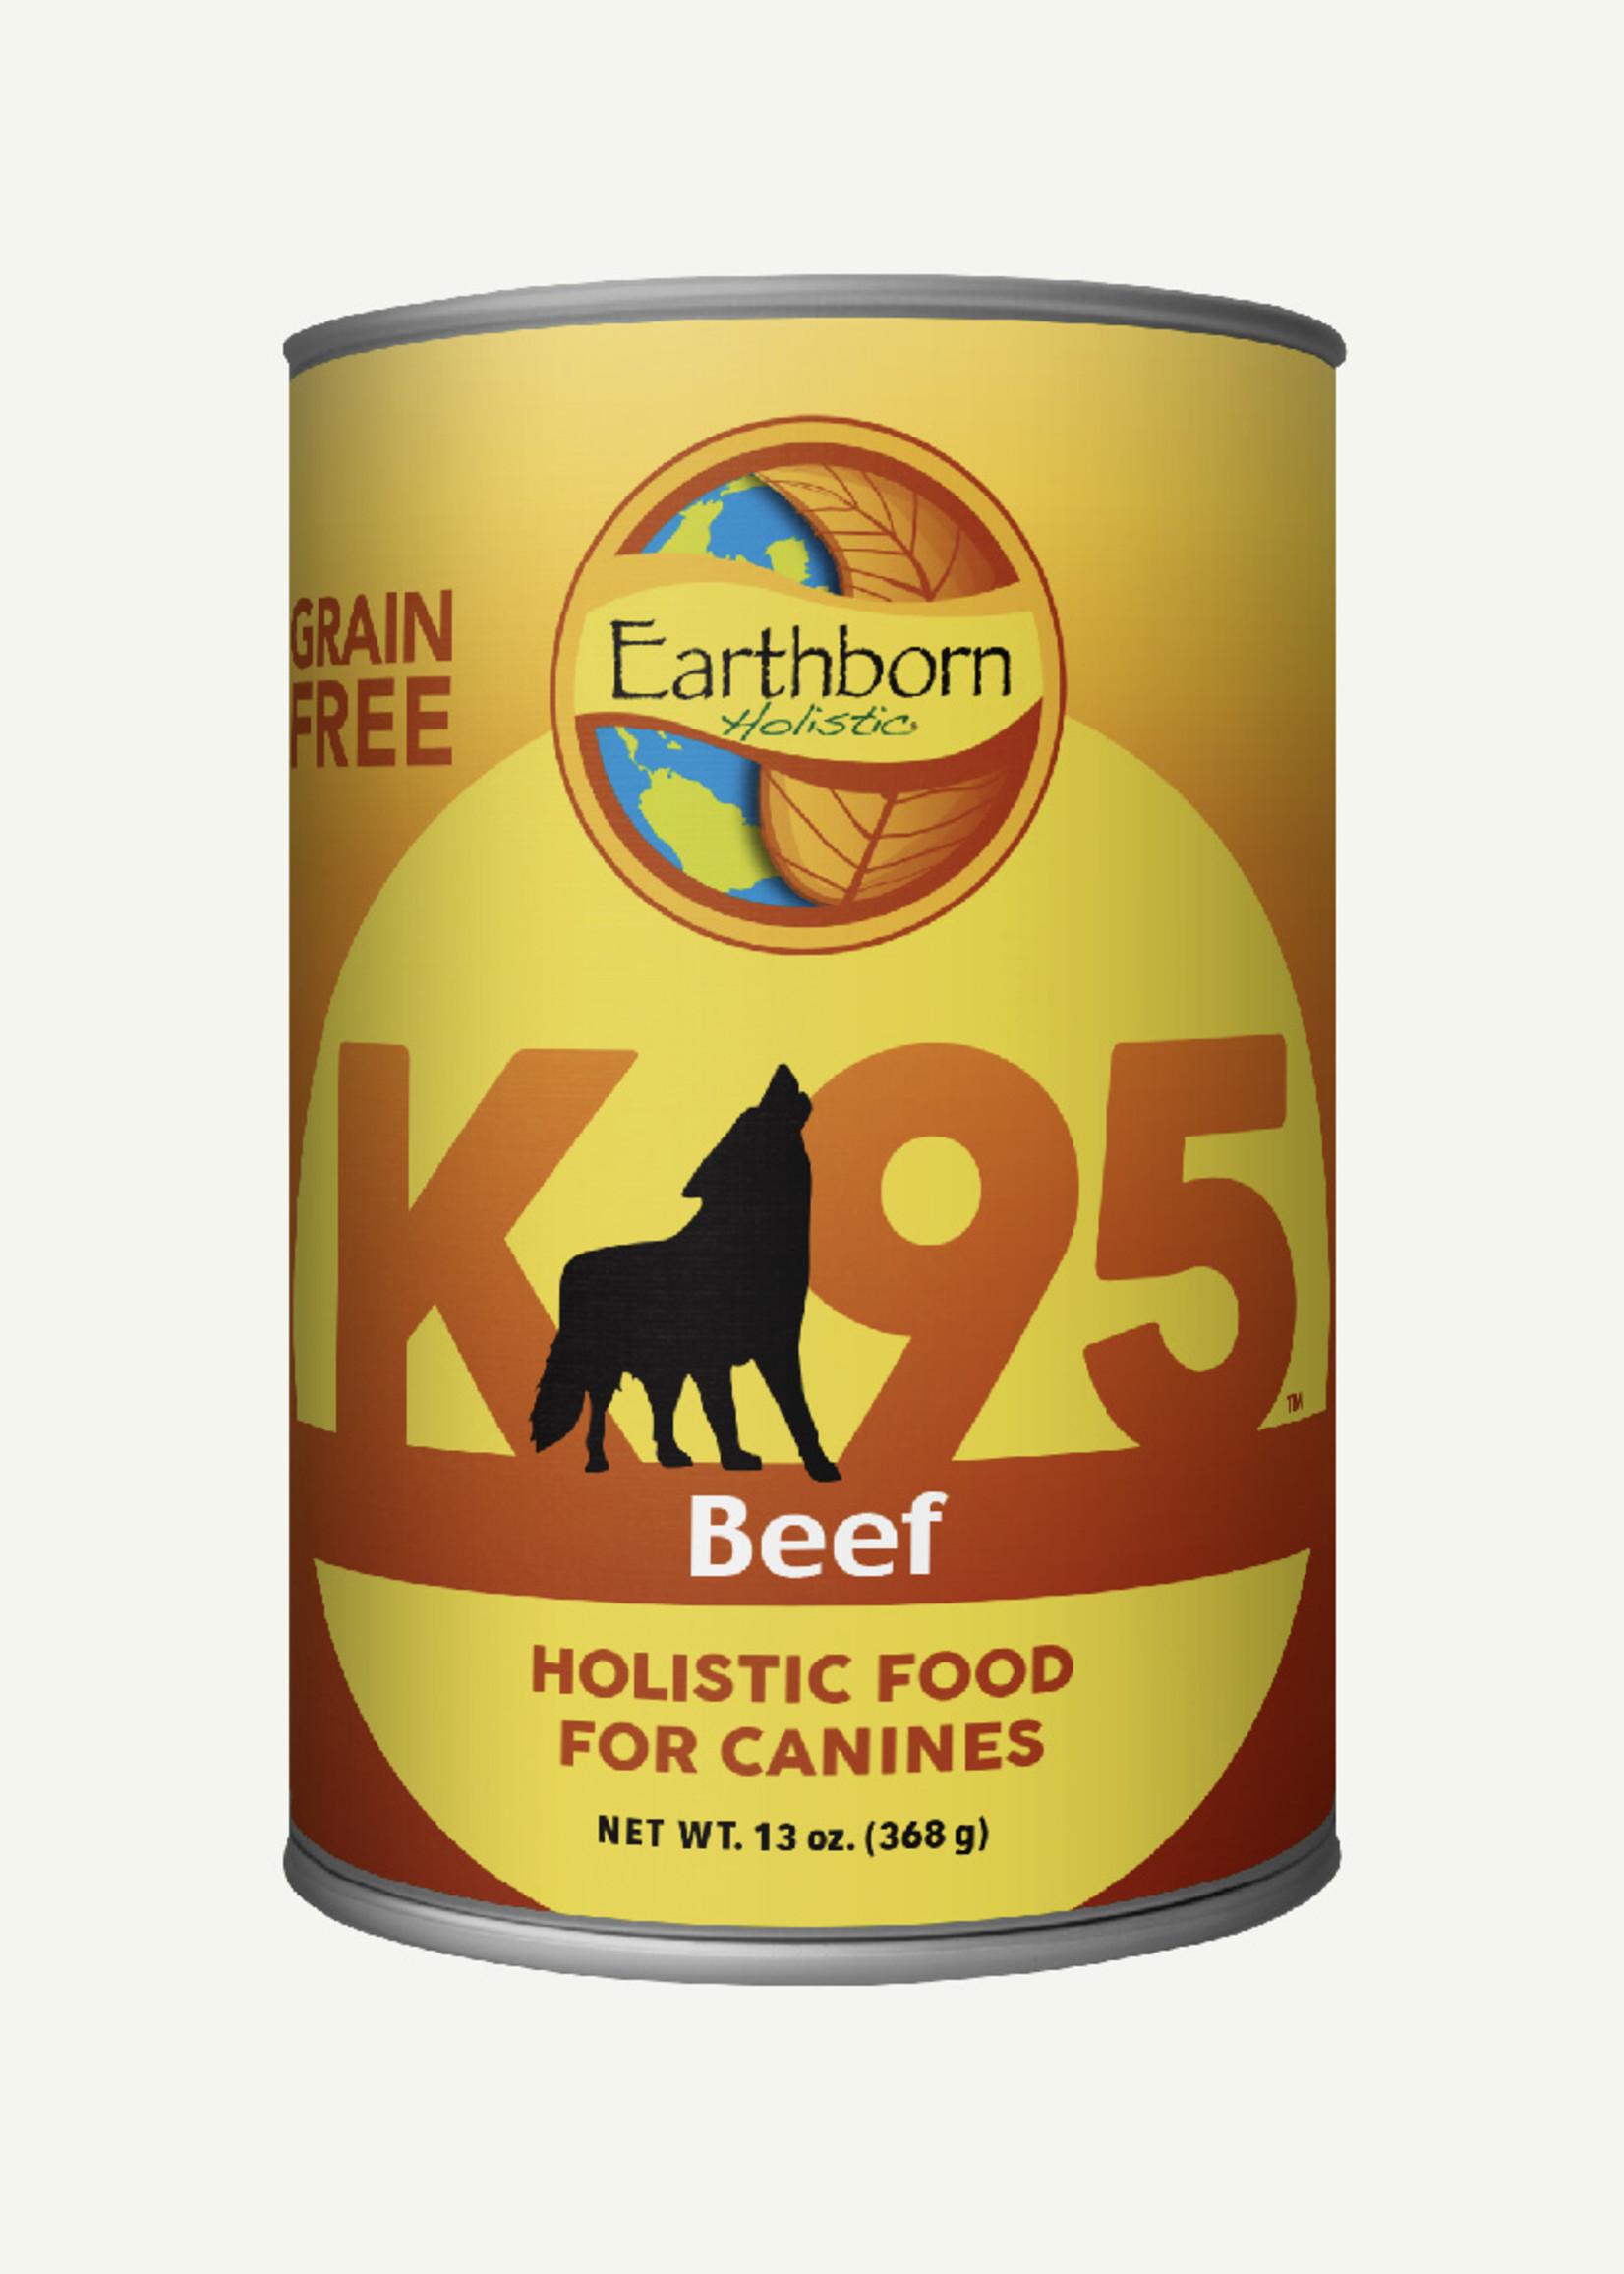 Earthborn Earthborn K95 Beef Grain Free 13 oz